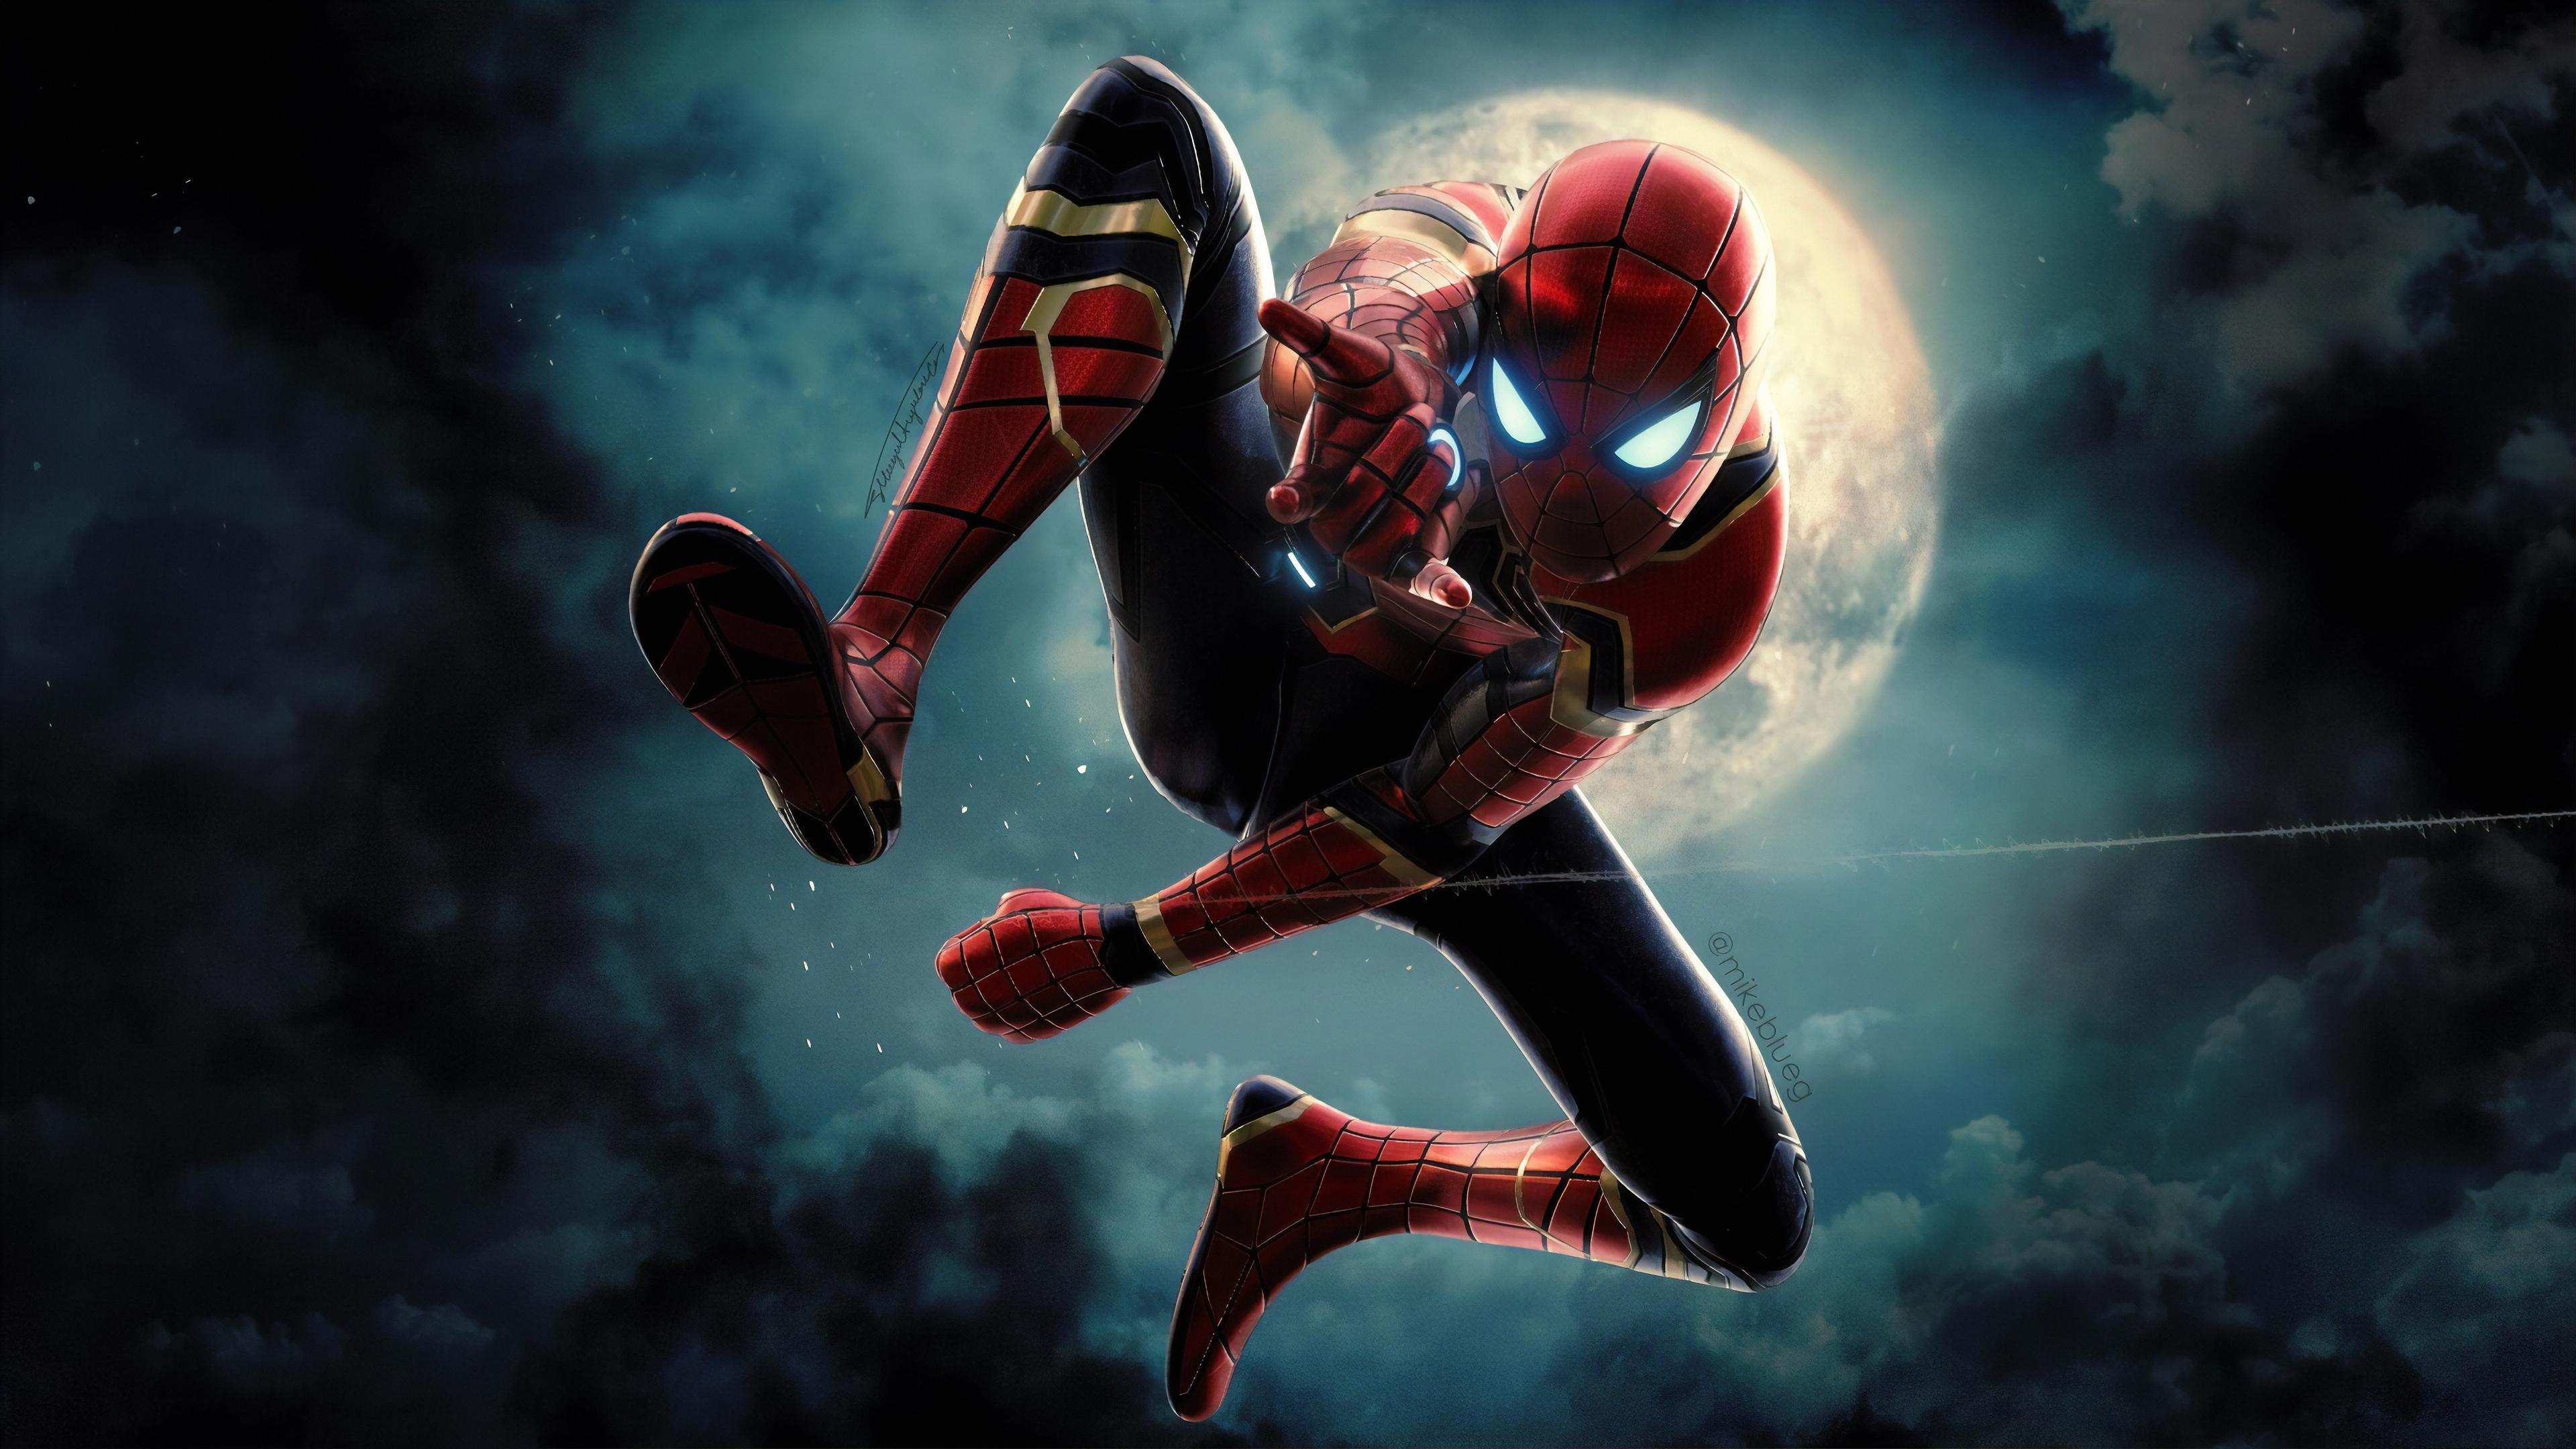 Spider-Man 4k Ultra HD Wallpaper | Background Image ...